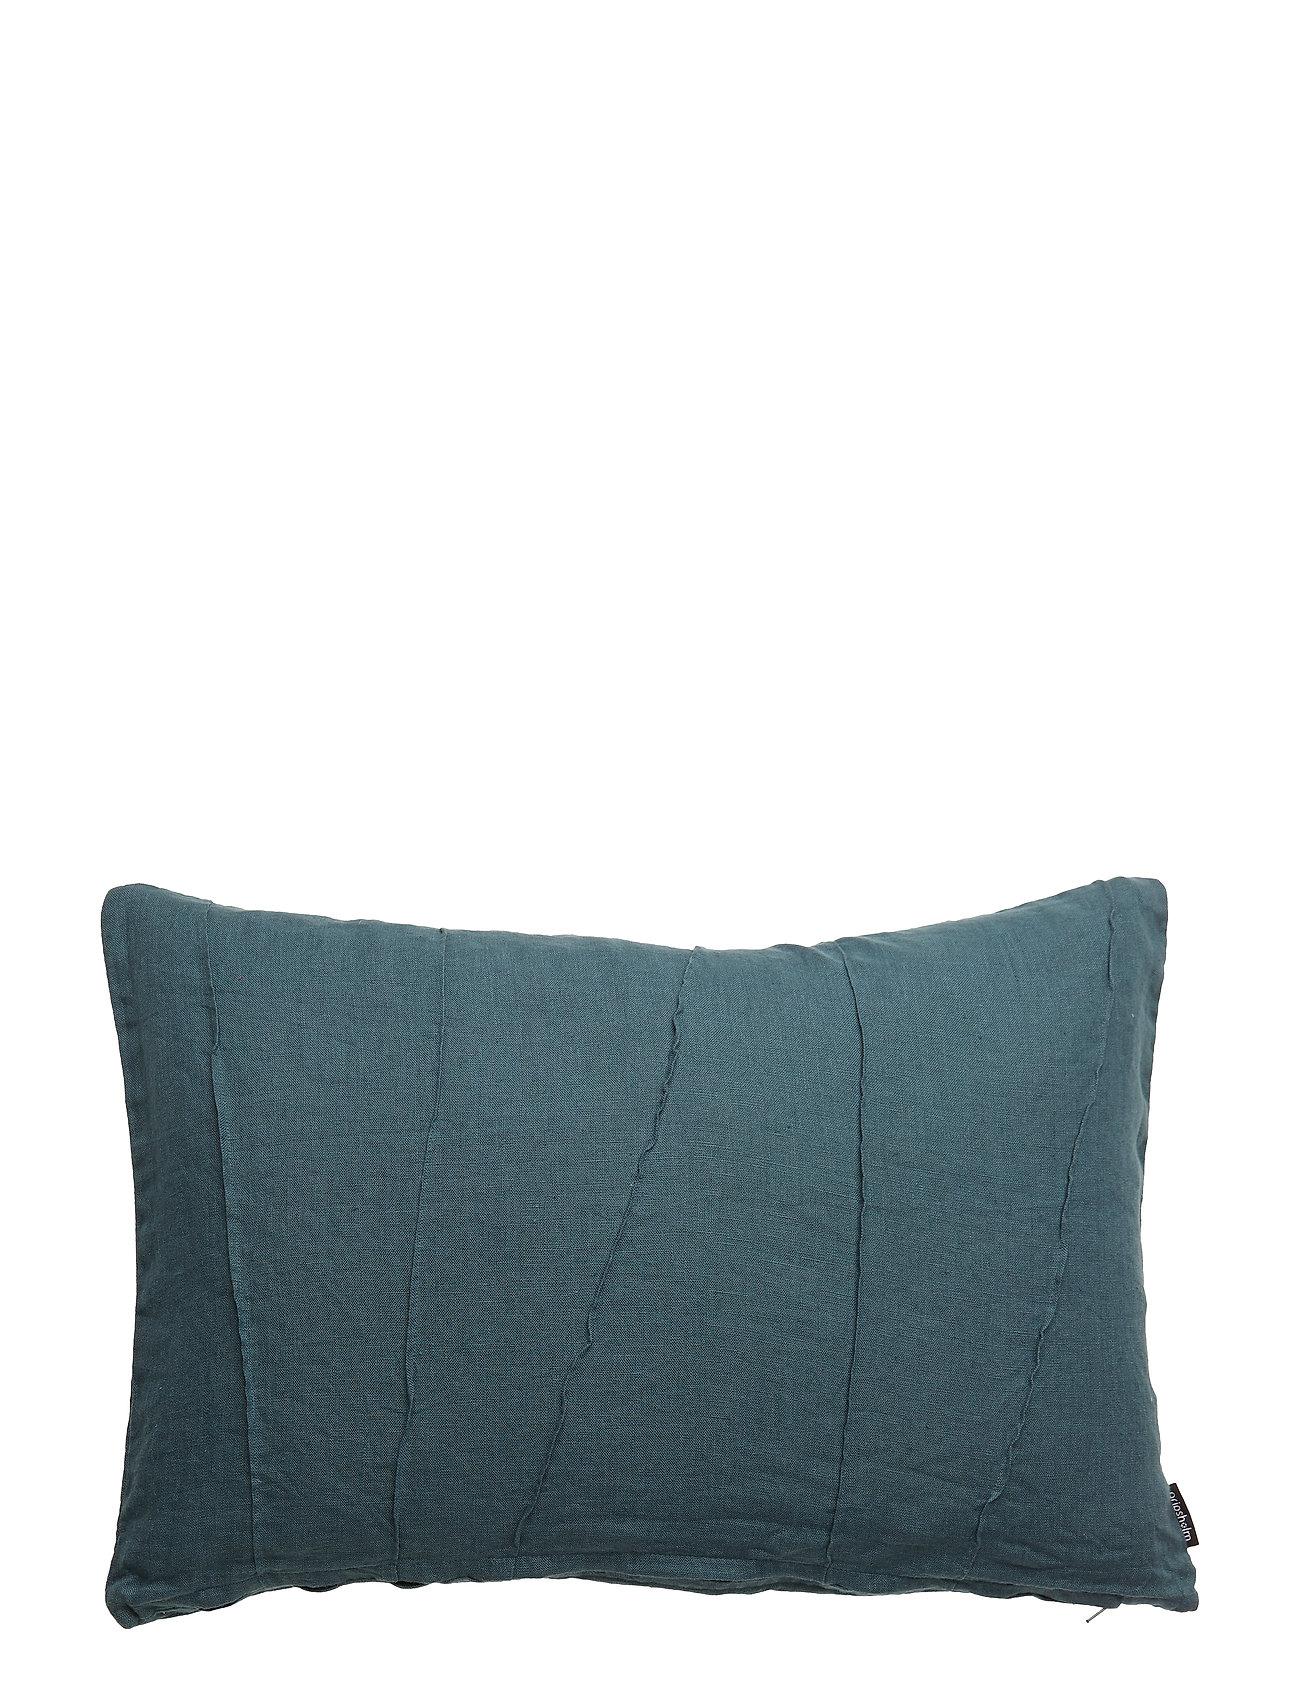 PetrolGripsholm Josefdark Josefdark Cushion Cover Cushion Josefdark Cover Cushion PetrolGripsholm Cover YebEWDH29I